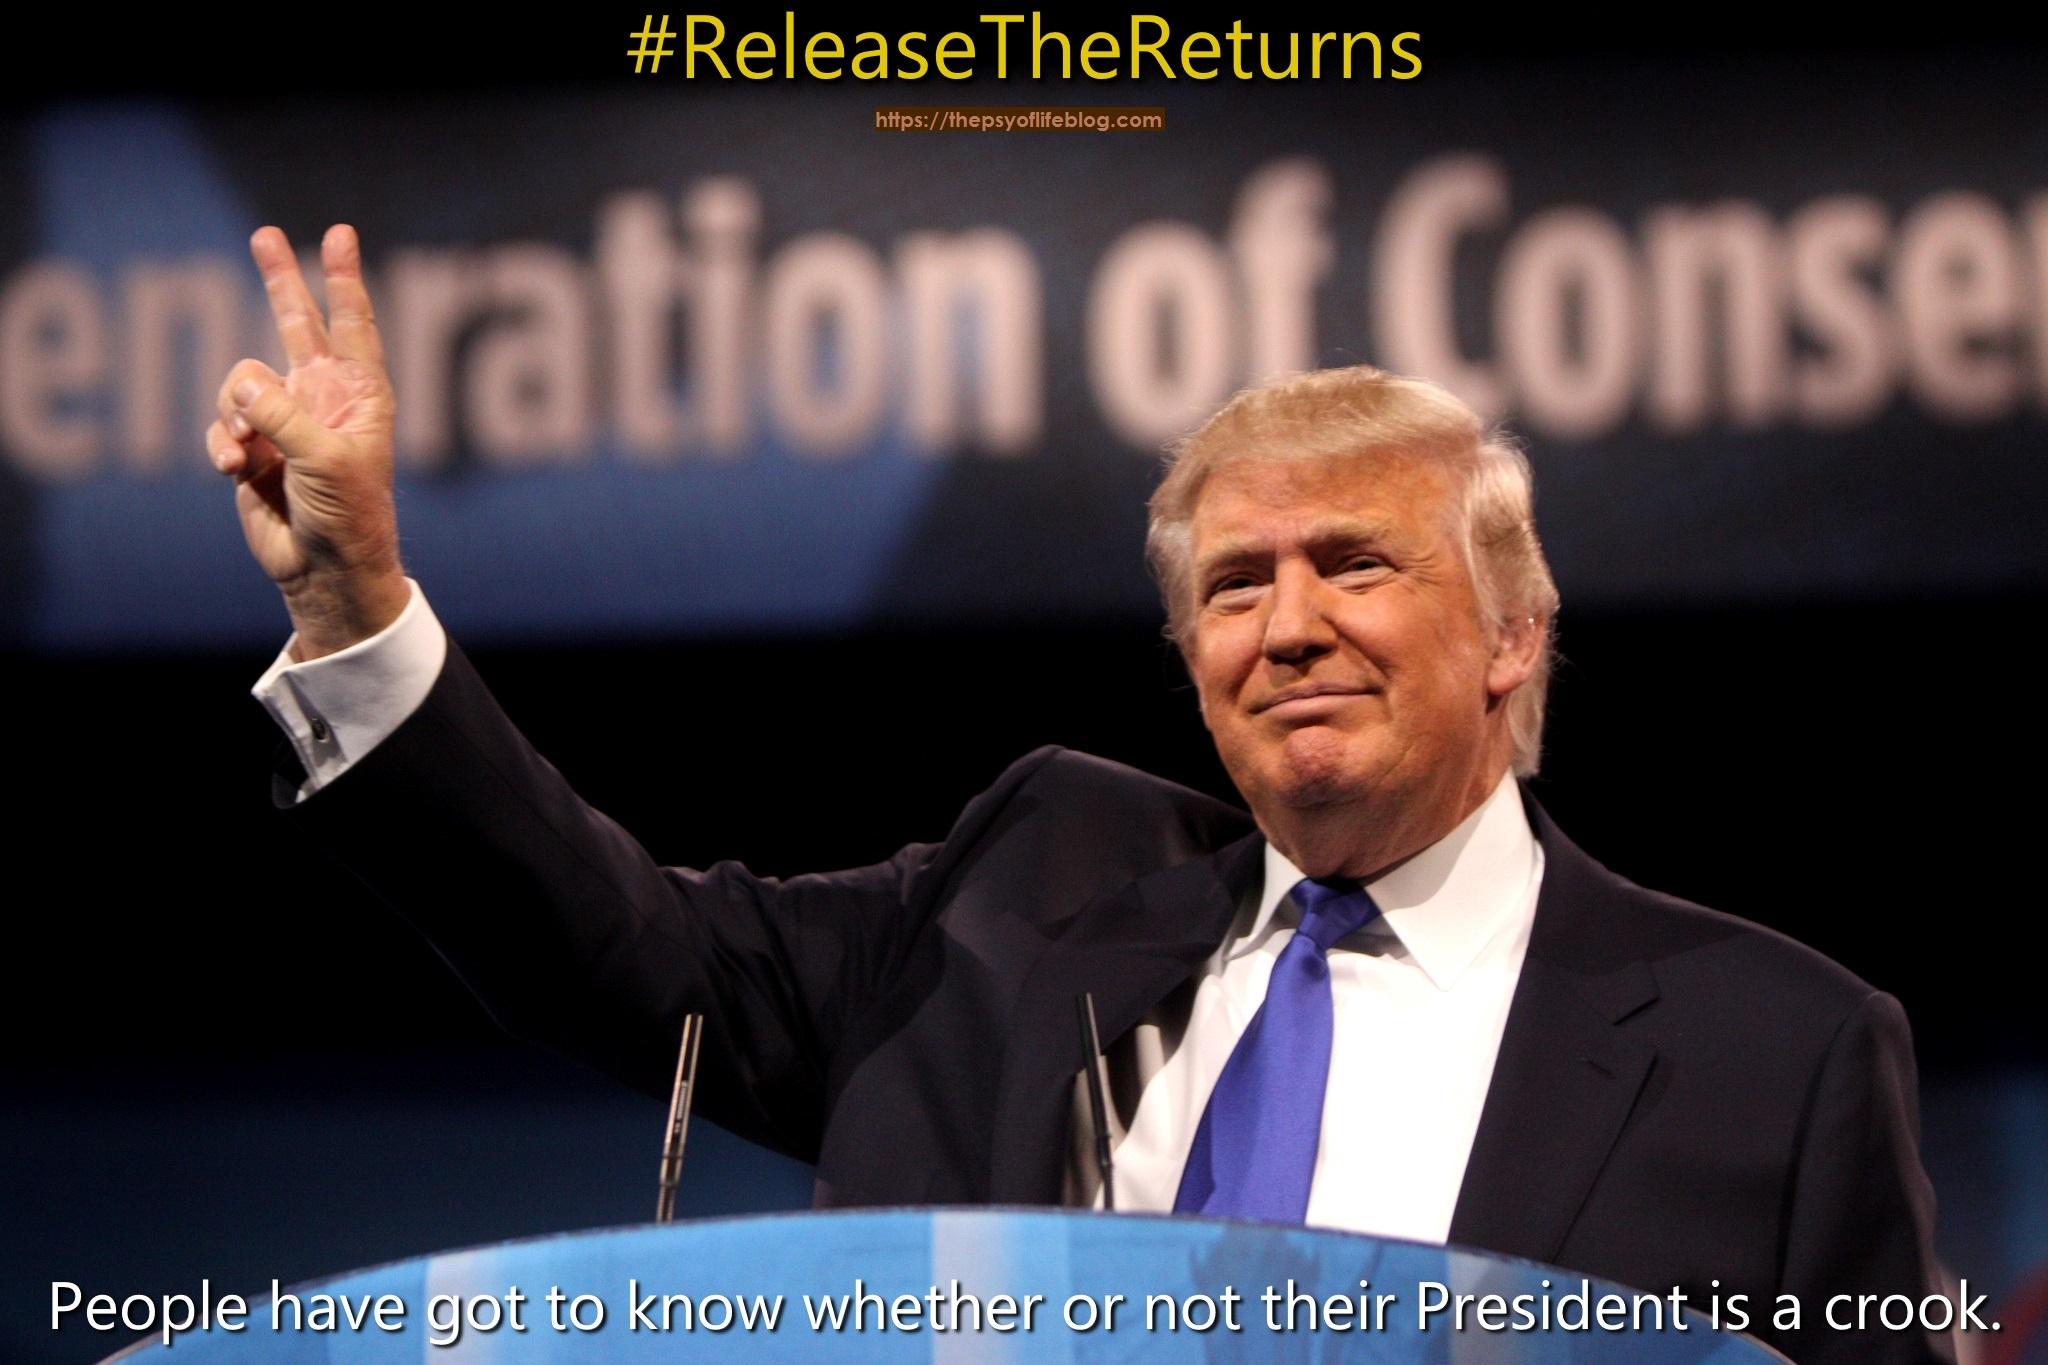 Nixon #ReleaseTheReturns Crook